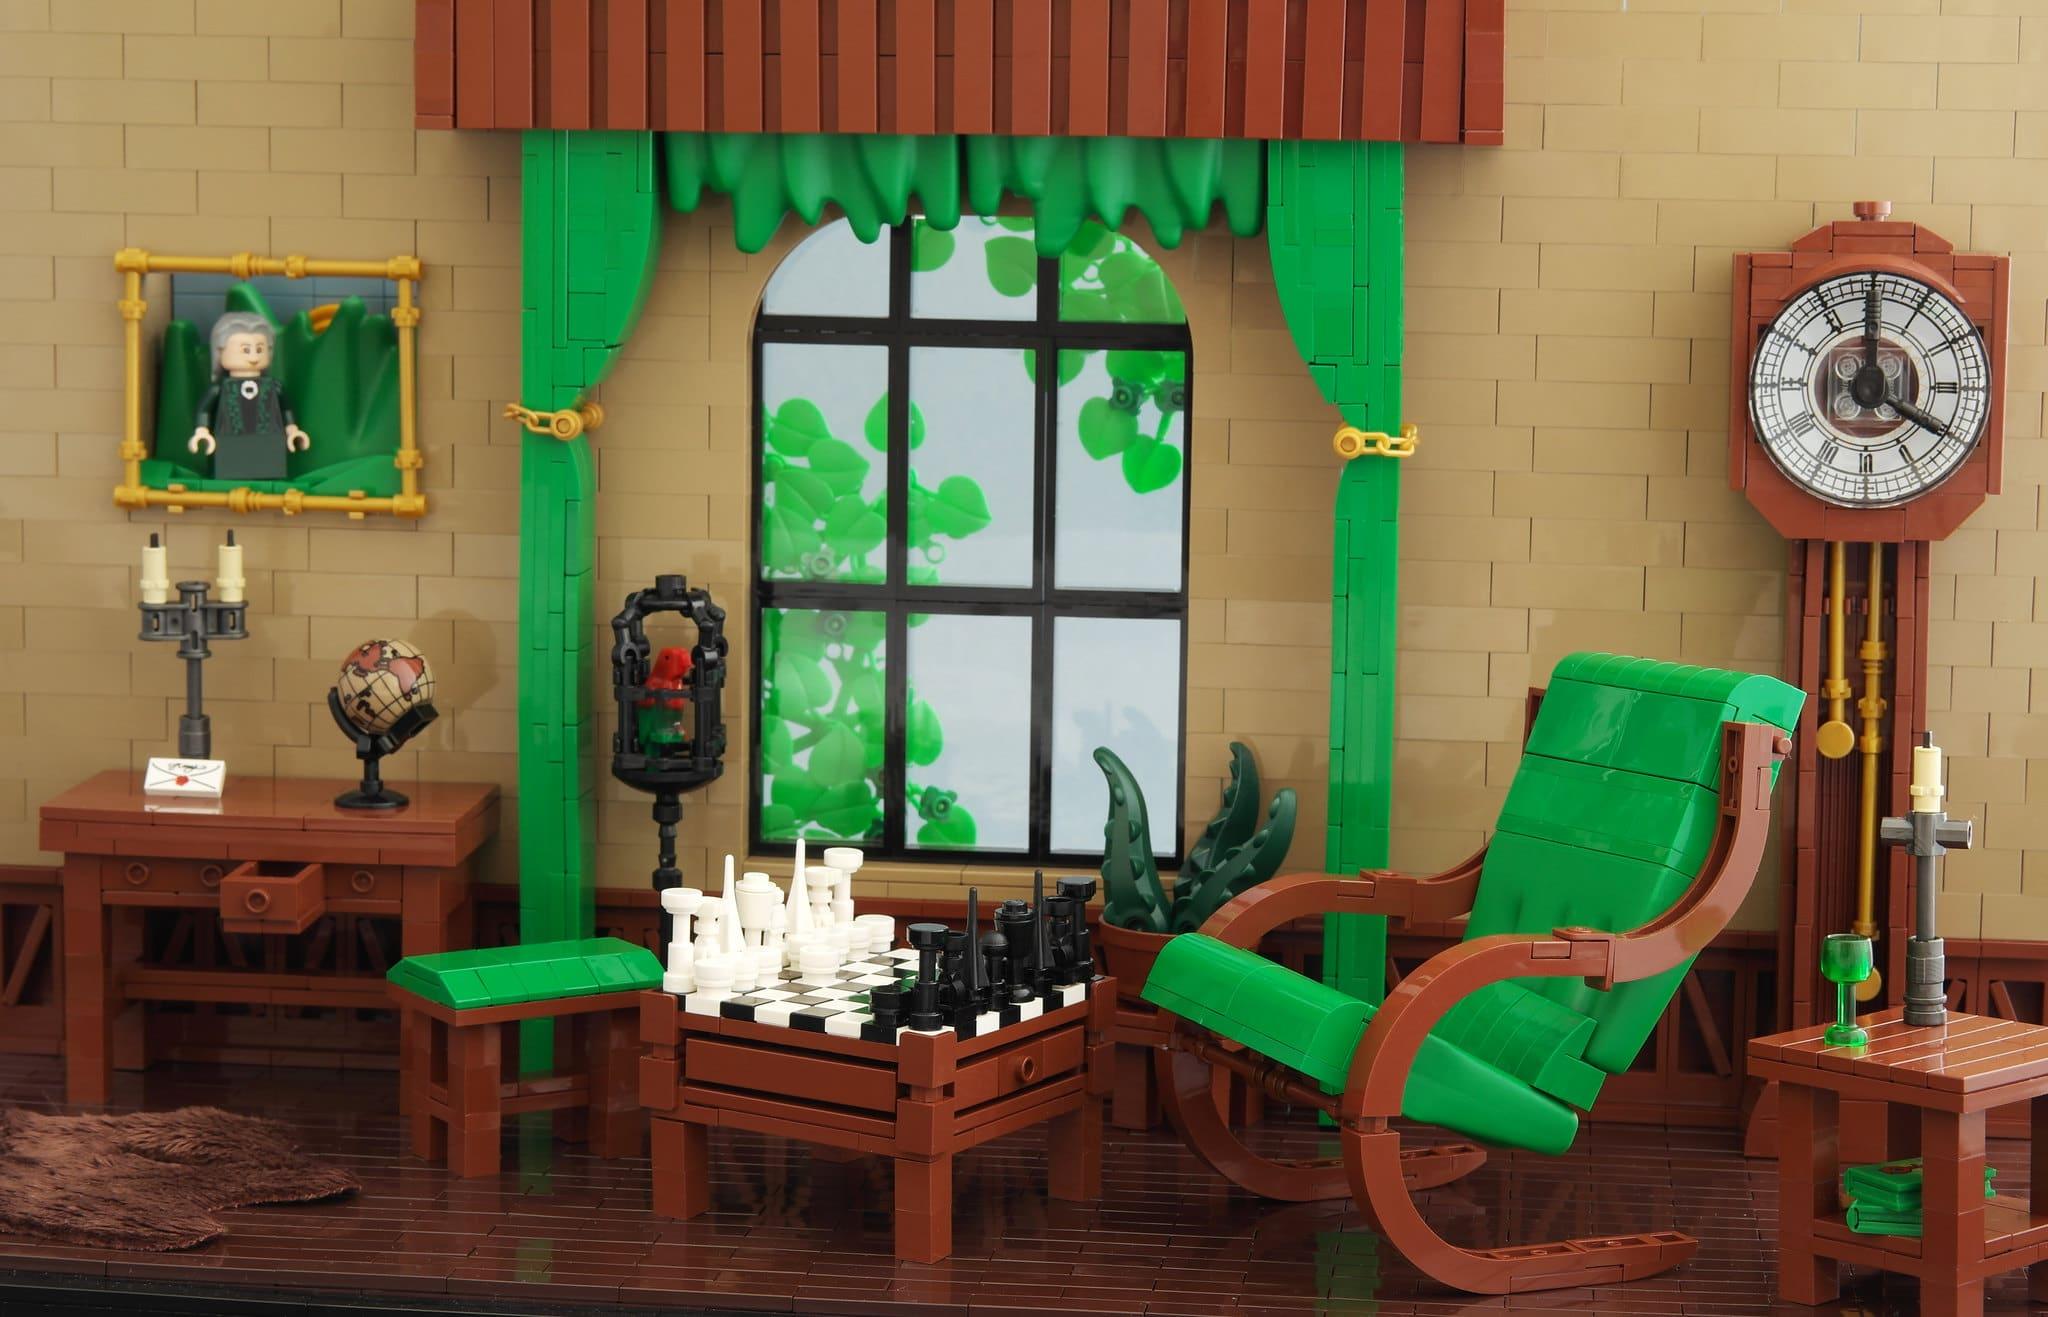 LEGO Iron Builder Duplo Gras Green Lounge (2)